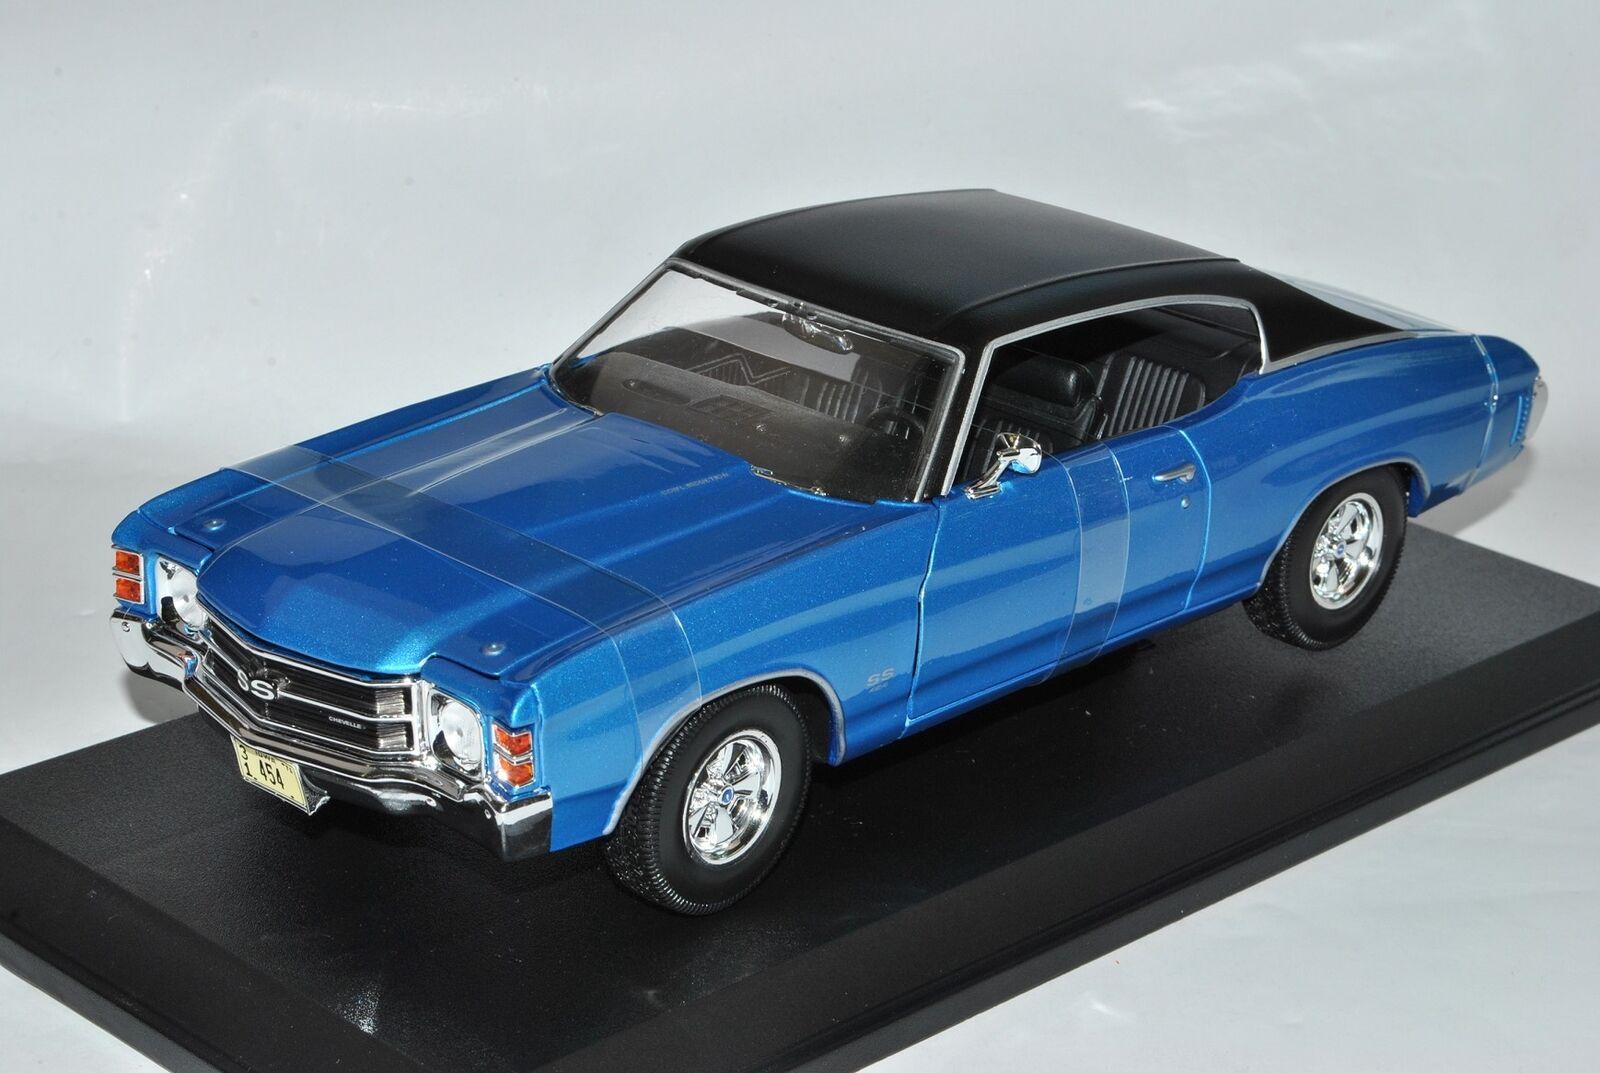 Chevrolet Chevy Chevelle SS454 Sport Coupe blue blue blue blackes Dach 1971 1 18 Maist.. 6e4b67